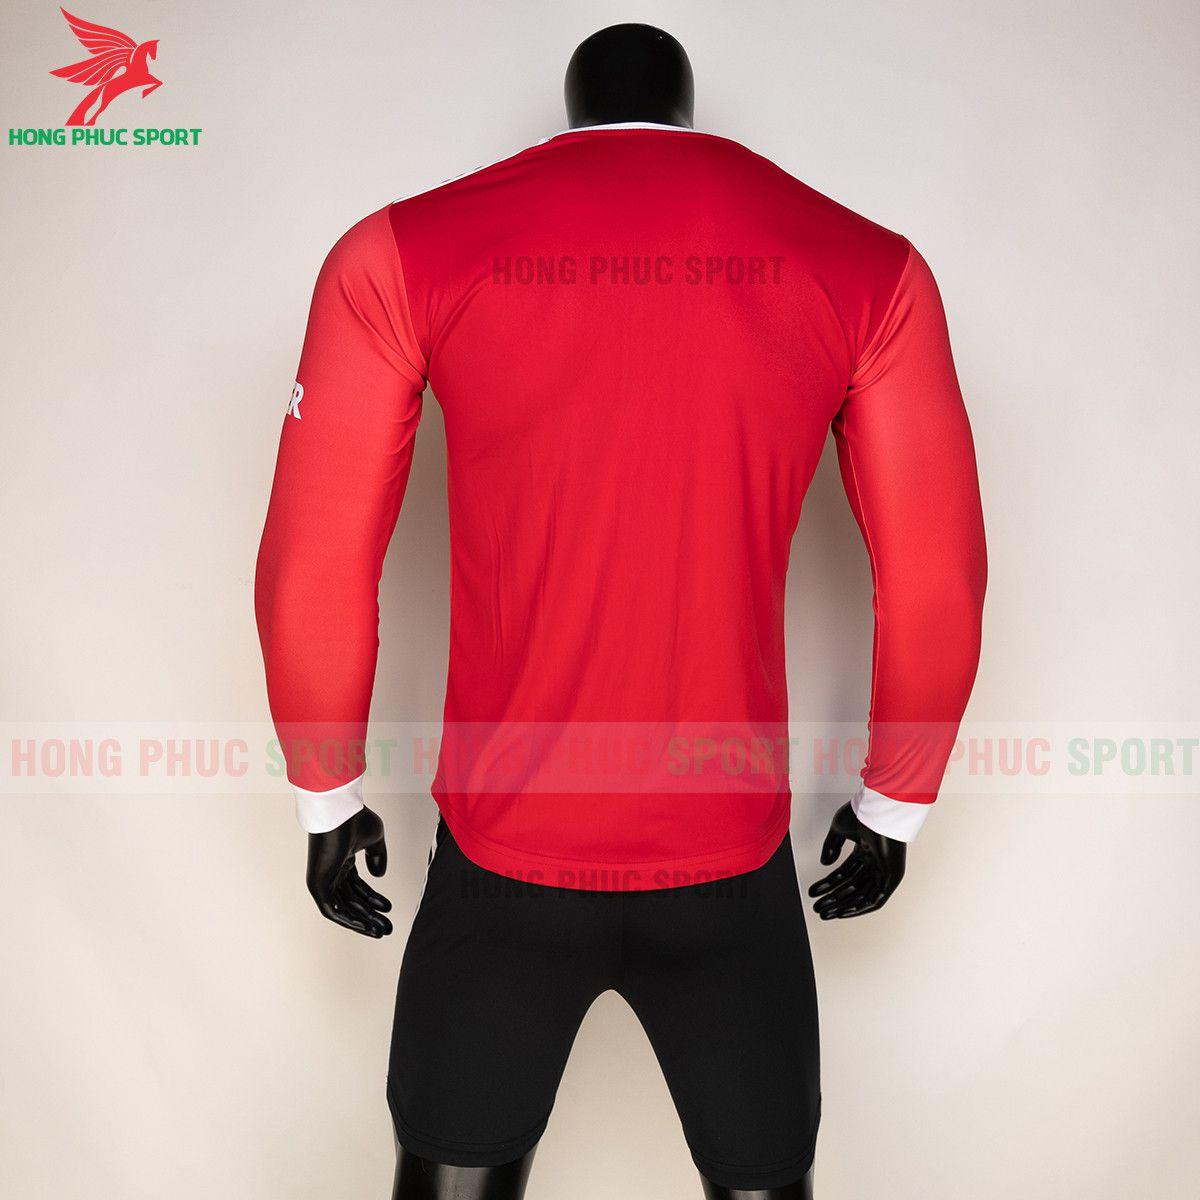 https://cdn.hongphucsport.com/unsafe/s4.shopbay.vn/files/285/ao-bong-da-tay-dai-man-utd-2021-22-san-nha-thun-lanh-61557fd161d7a.jpg